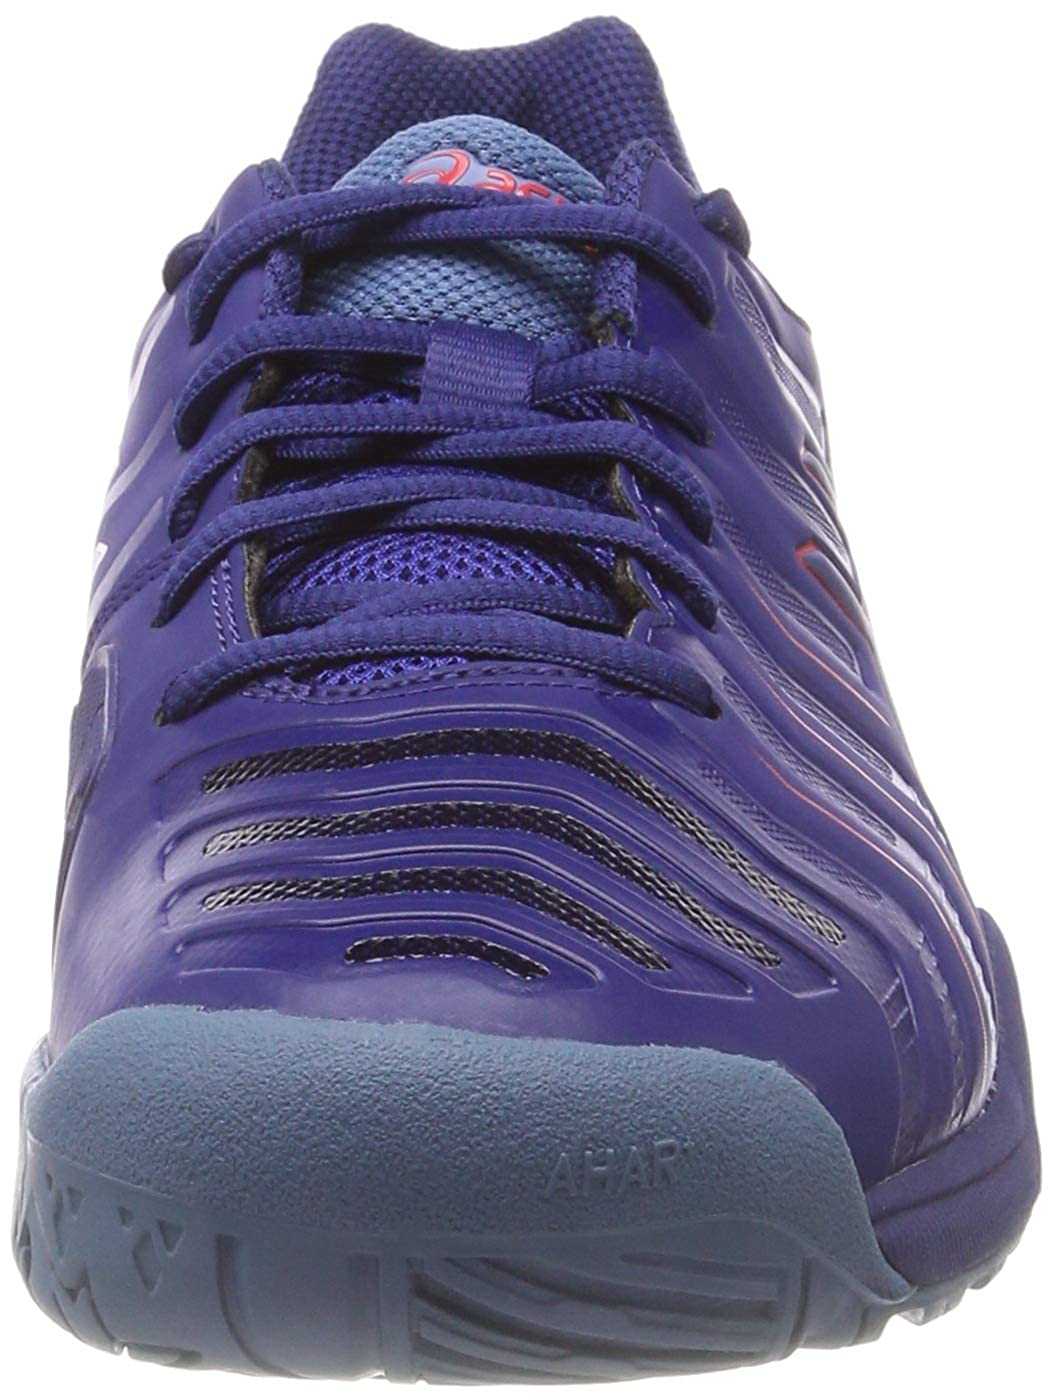 42ad1f38b5c7 ASICS Men s s Gel-Challenger 11 Tennis Shoes White  Amazon.co.uk  Shoes    Bags